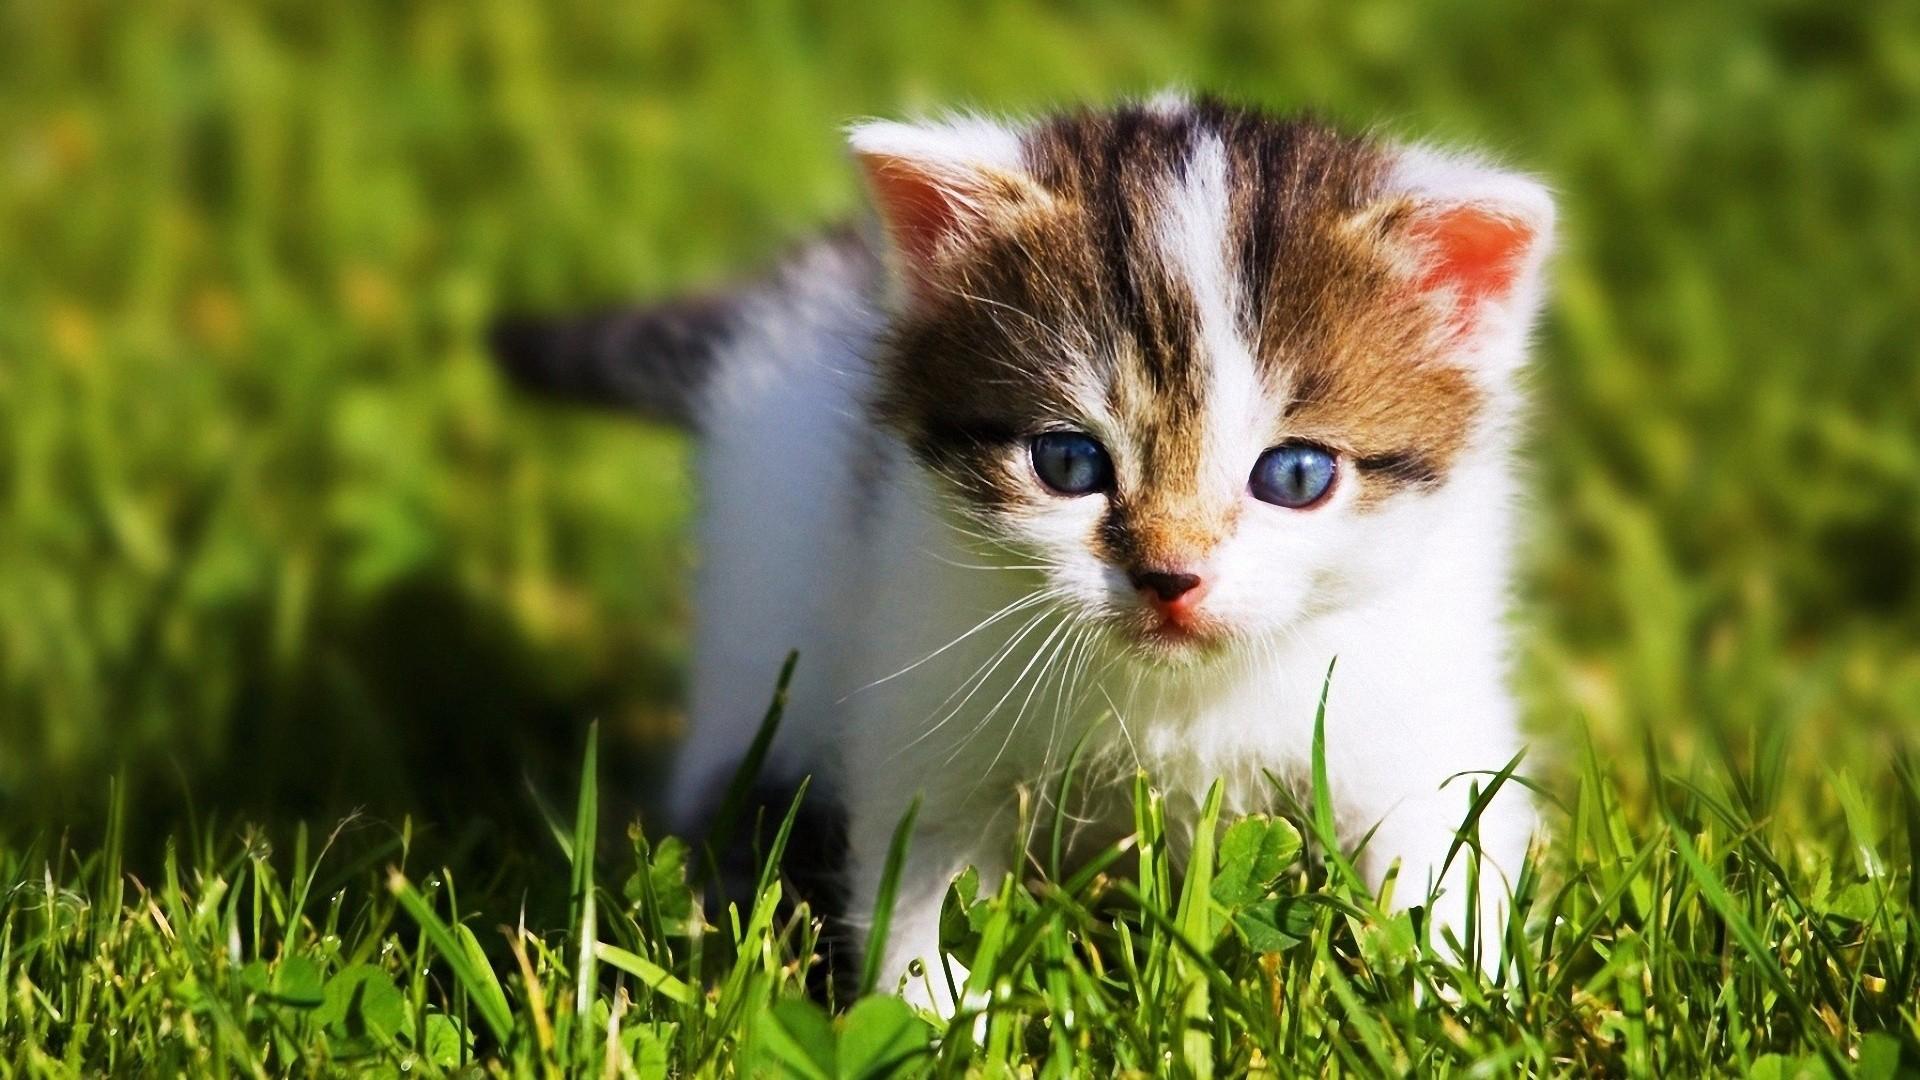 Fall Baby Animal Wallpaper Free Download Cute Baby Animal Wallpapers Pixelstalk Net